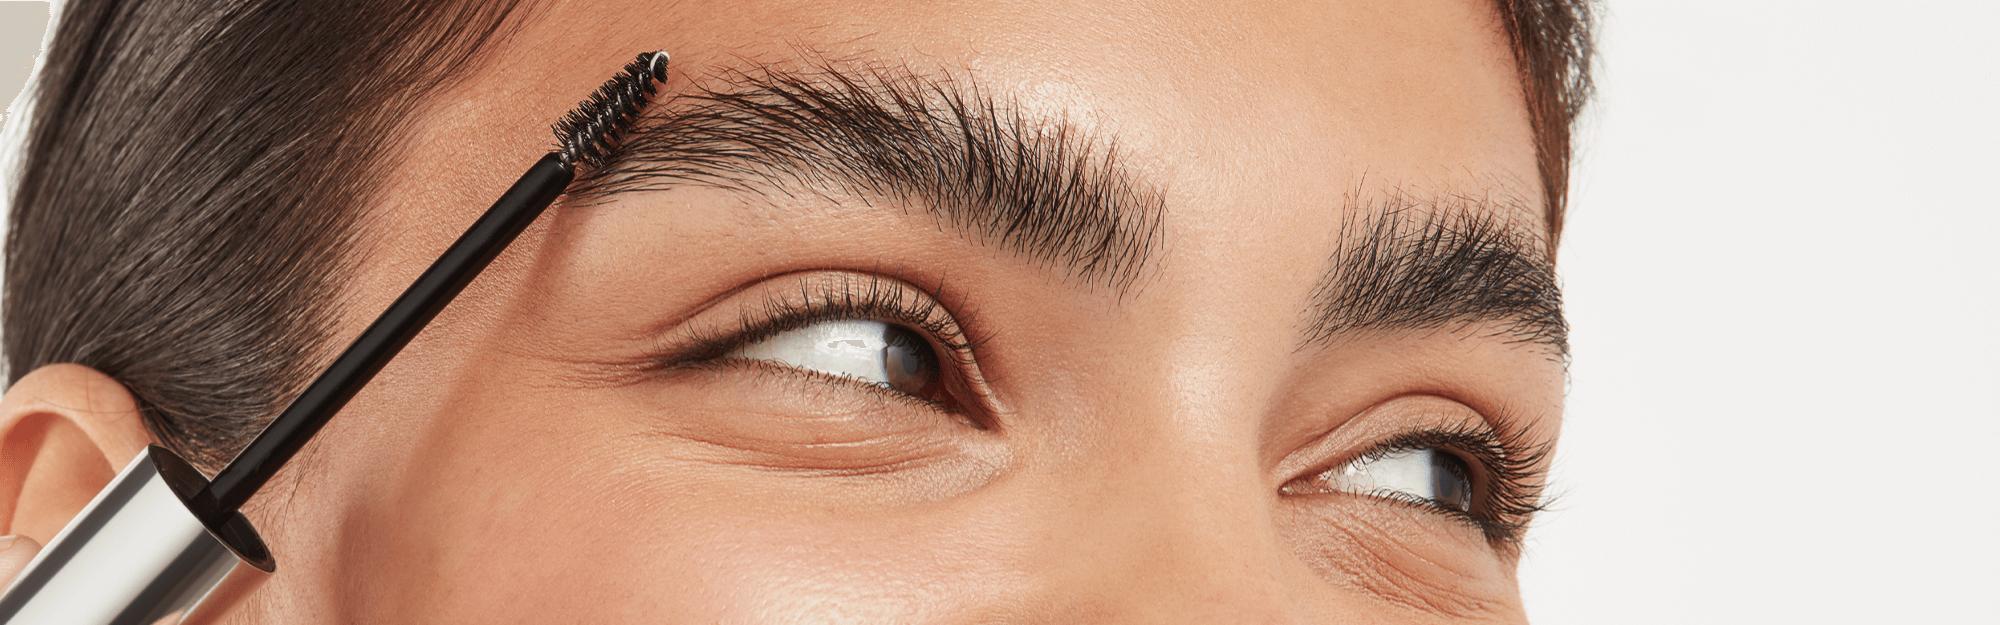 women applying clear brow gel